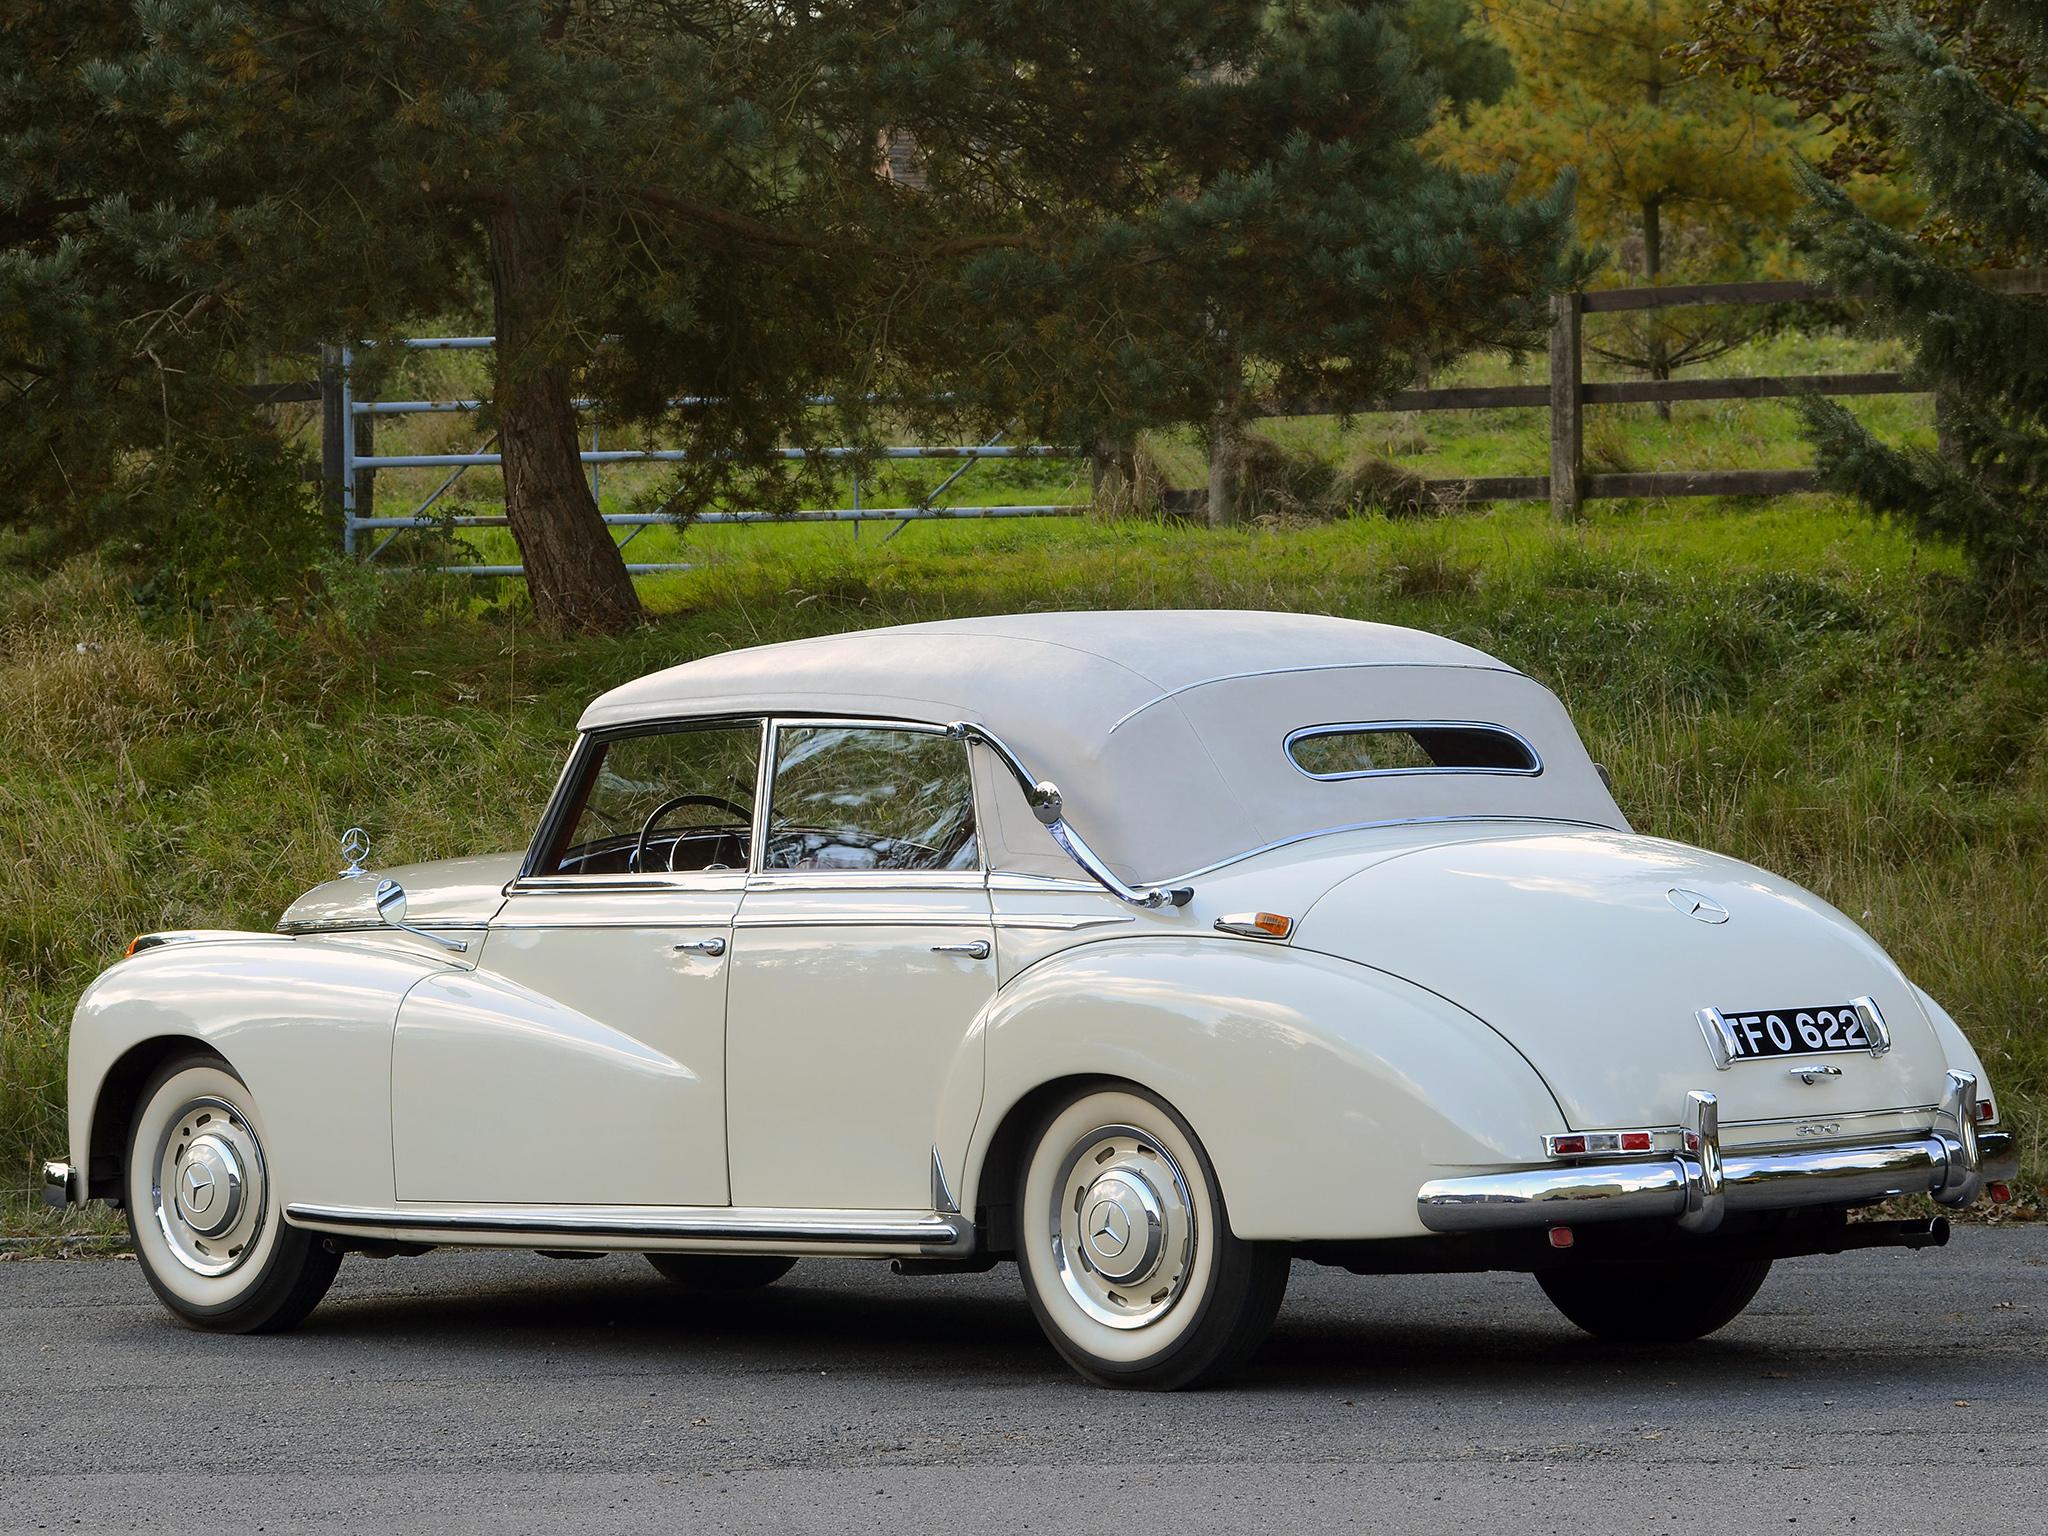 1951 mercedes benz 300 cabriolet d w186 luxury retro h for Mercedes benz retro